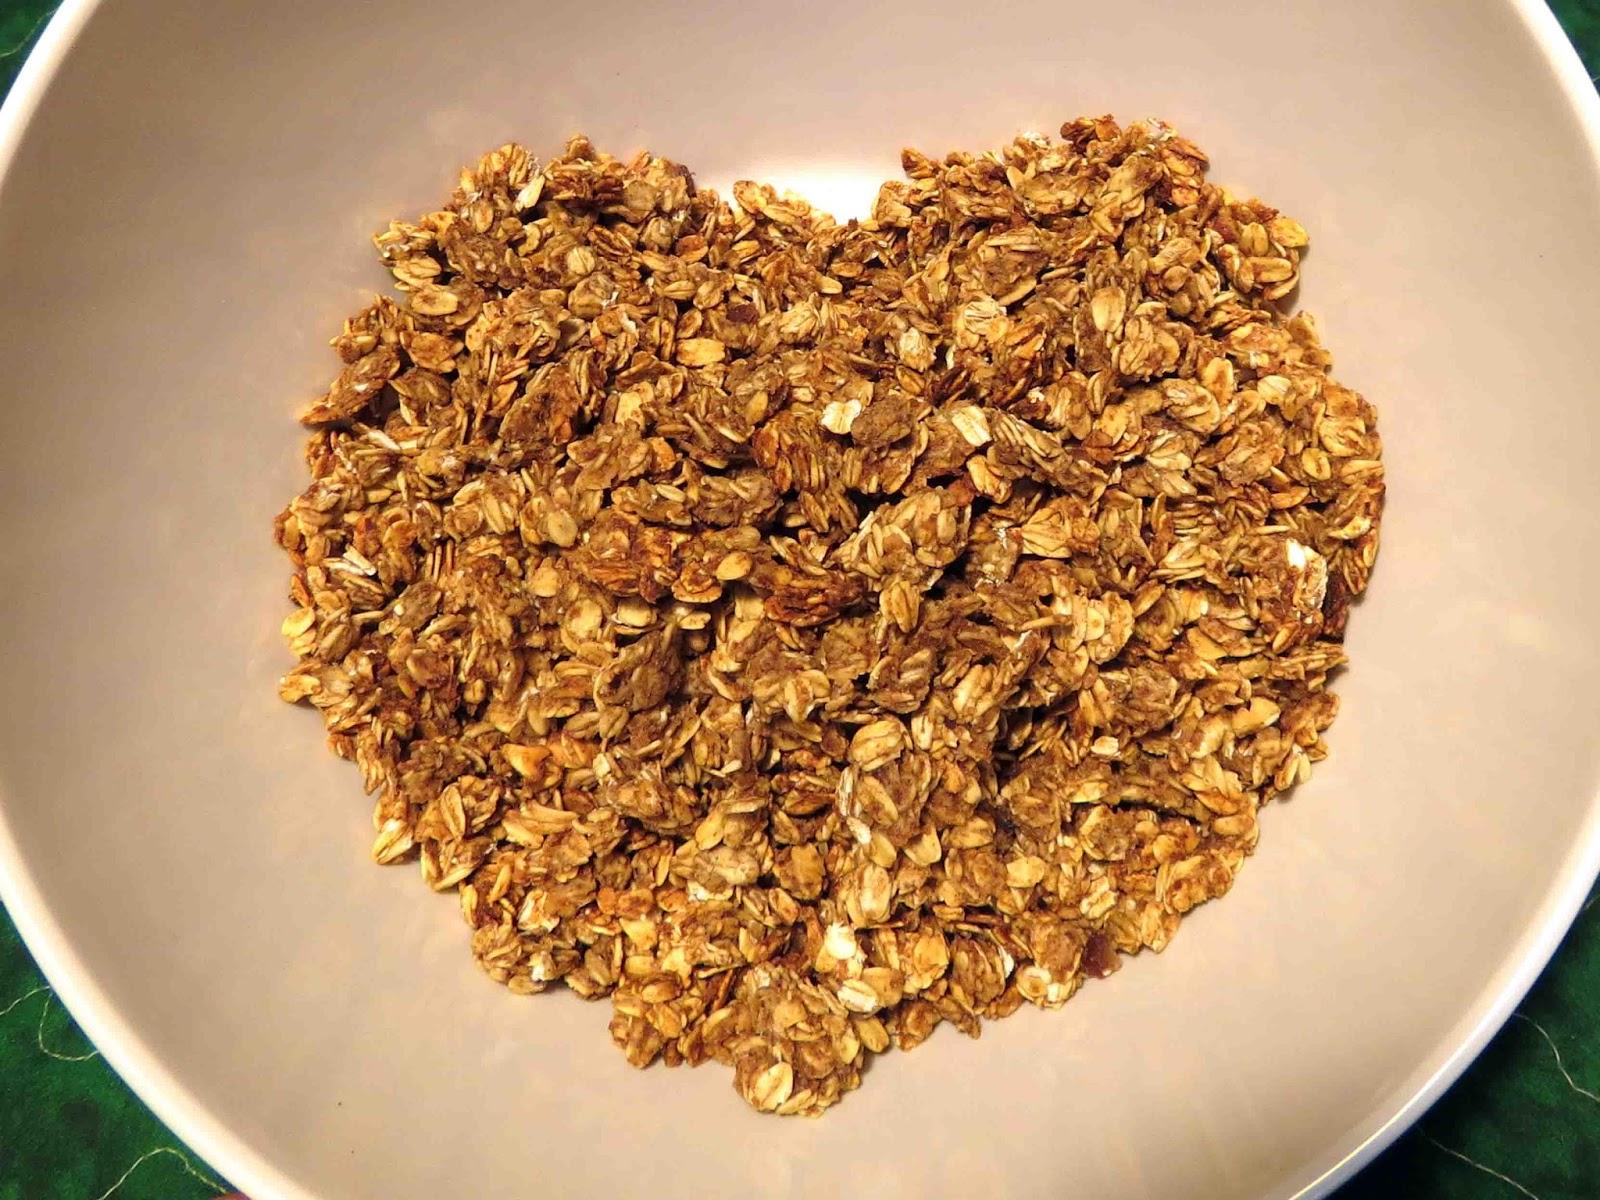 granola no oil or sugar